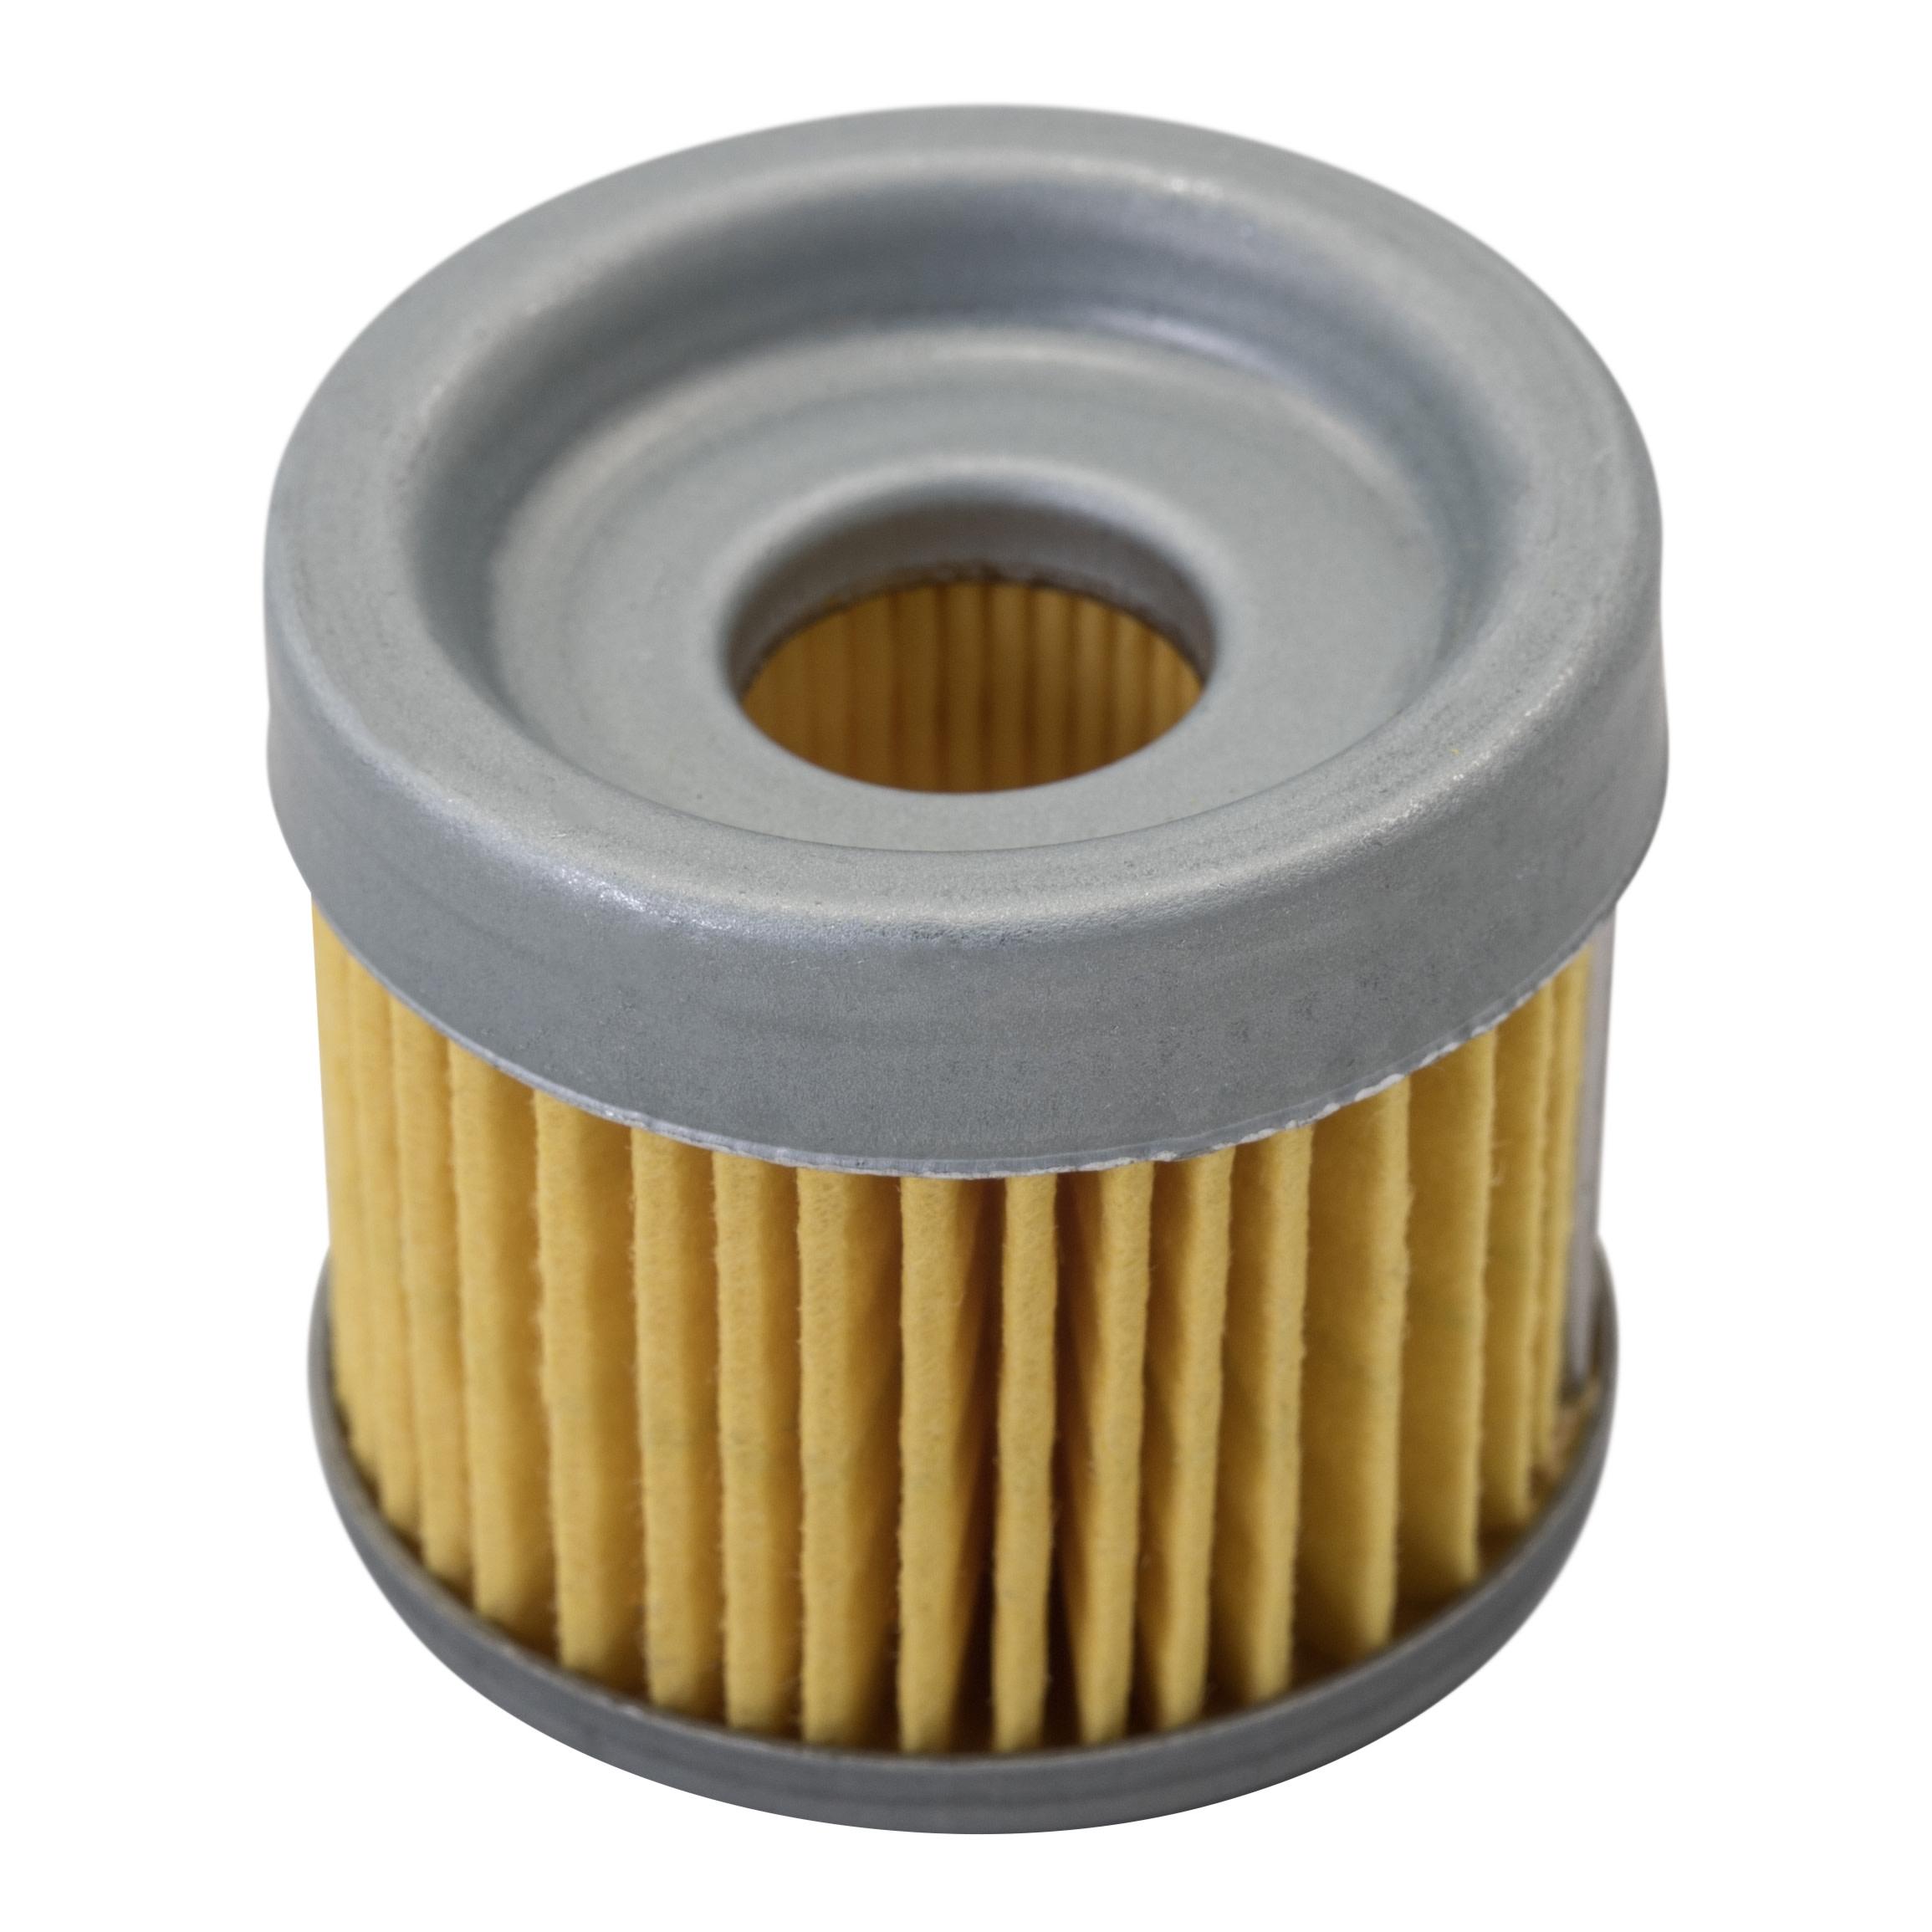 part 35-11004A 1 35-11004A1 OEM Mercury Quicksilver Filter Kit